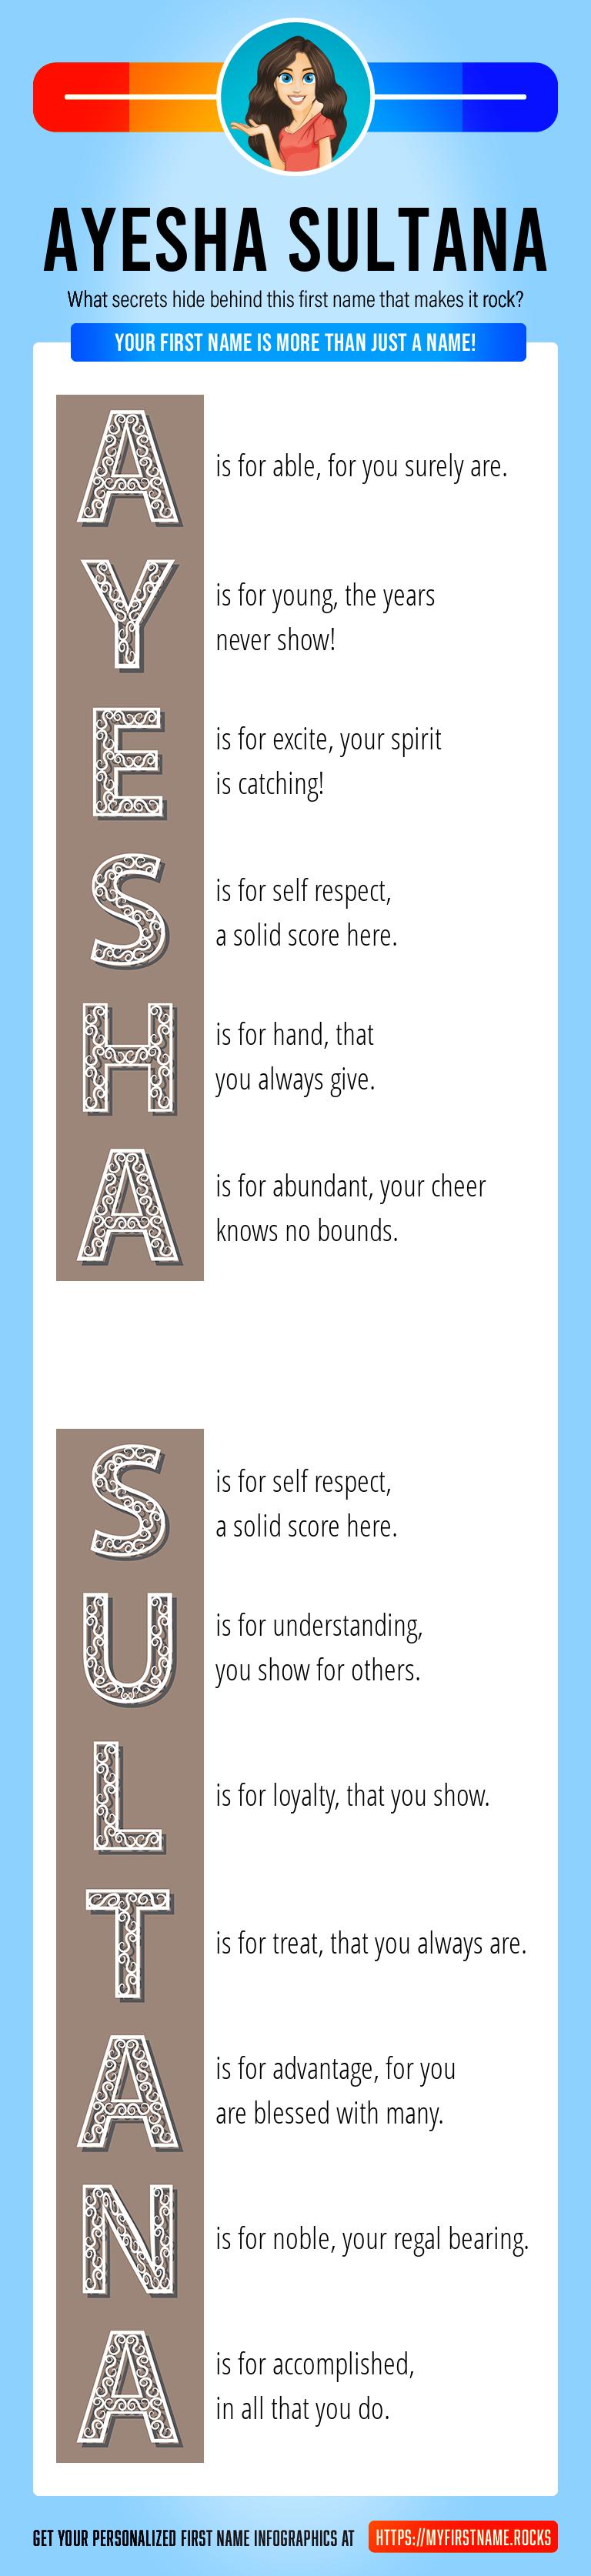 Ayesha Sultana Infographics